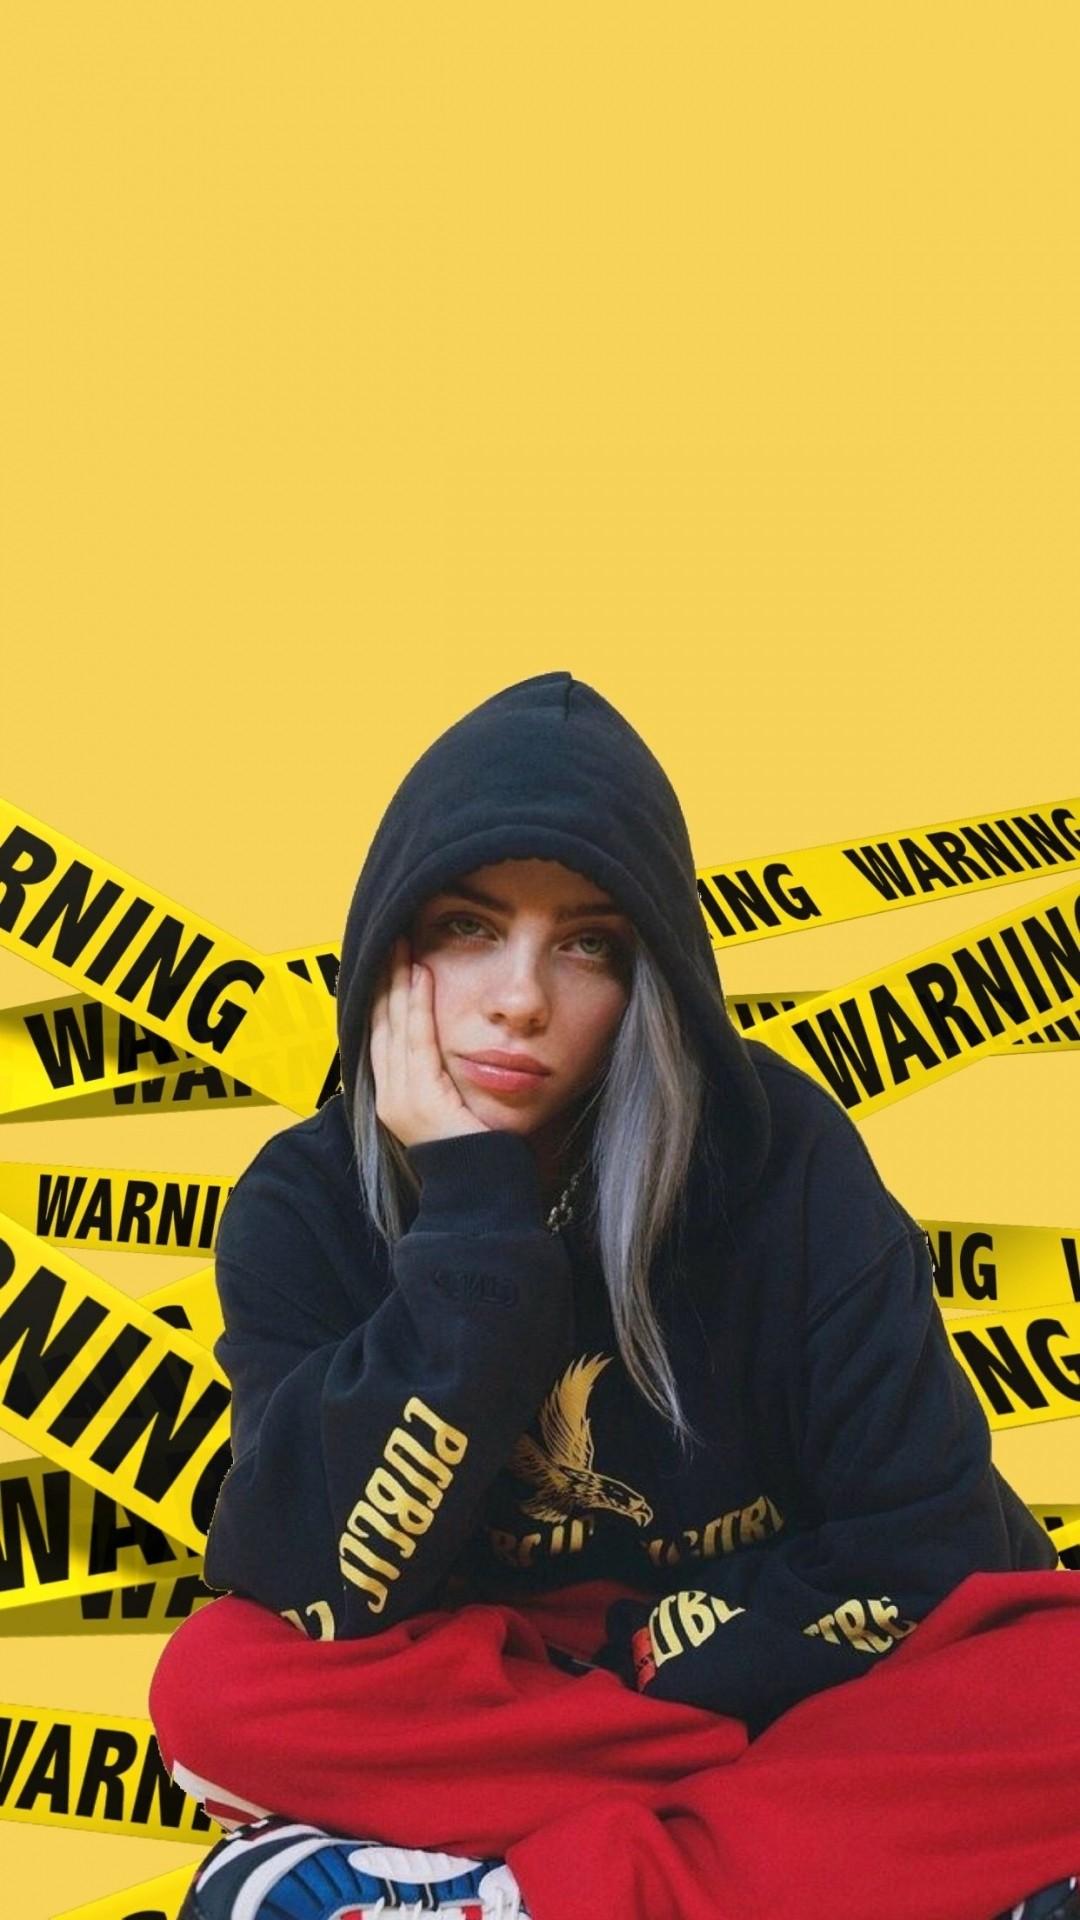 Billie Eilish phone wallpaper hd